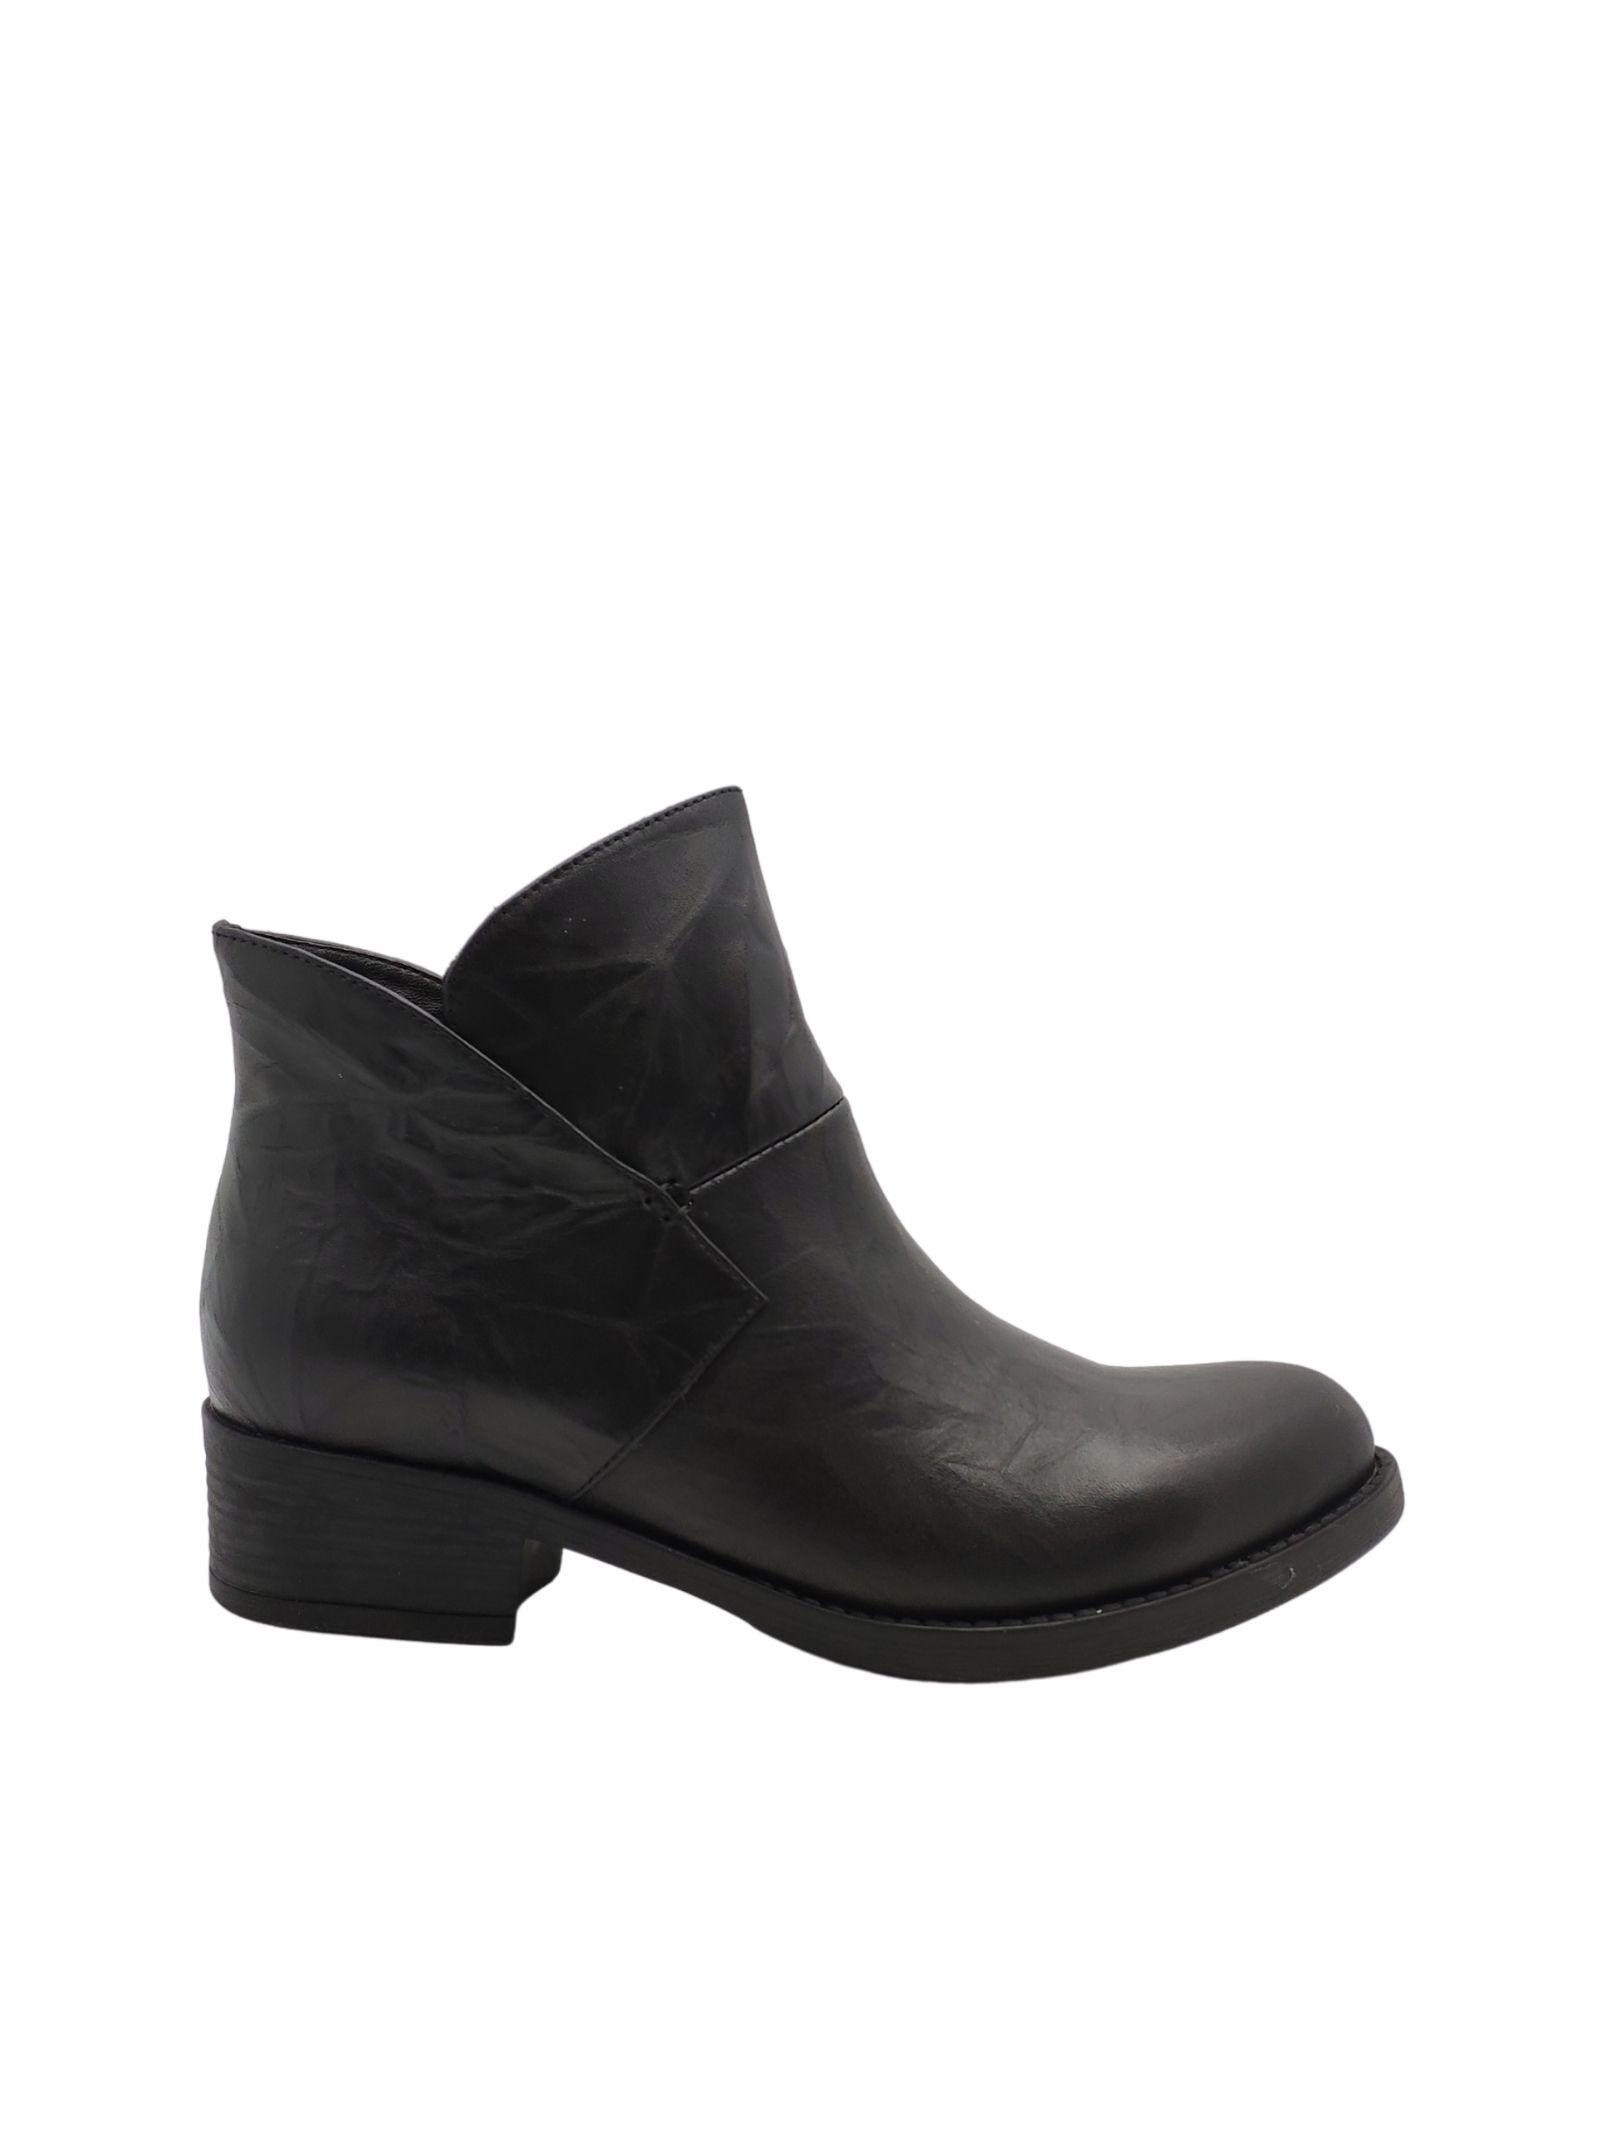 Stivaletti Ankle BootsDonna Manufacture D'Essai | Stivaletti | MDE44VITELLNERO